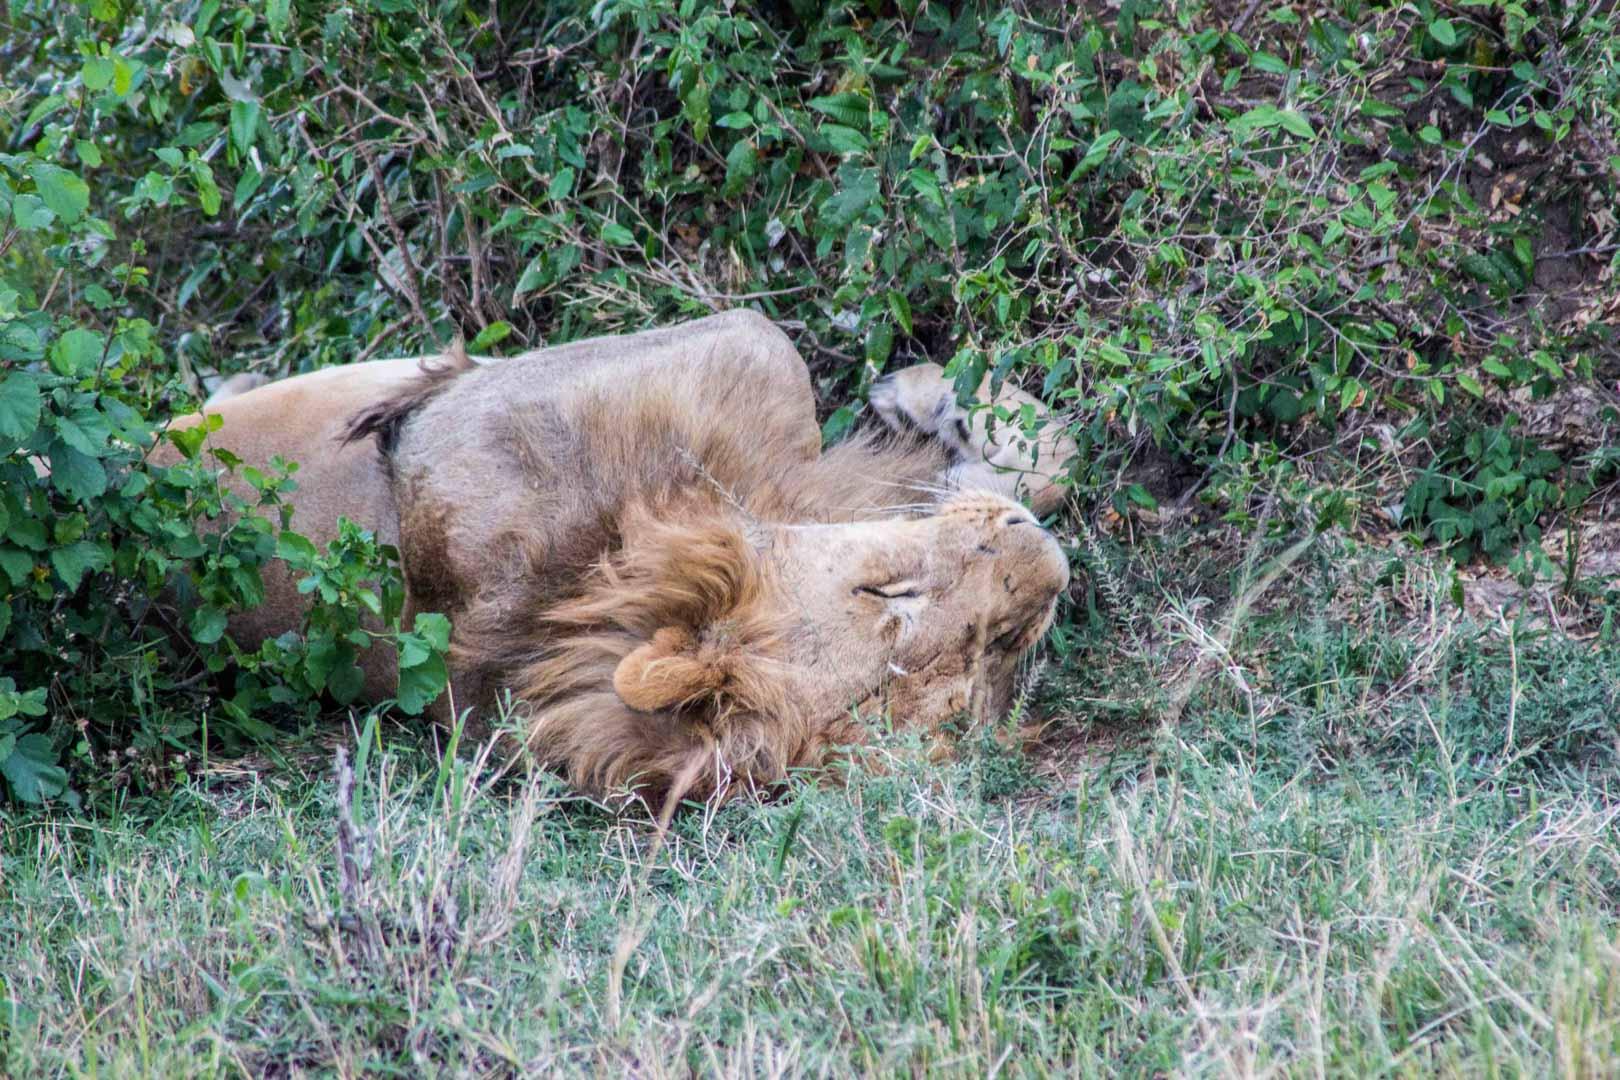 León durmiendo en Masai Mara, Kenia